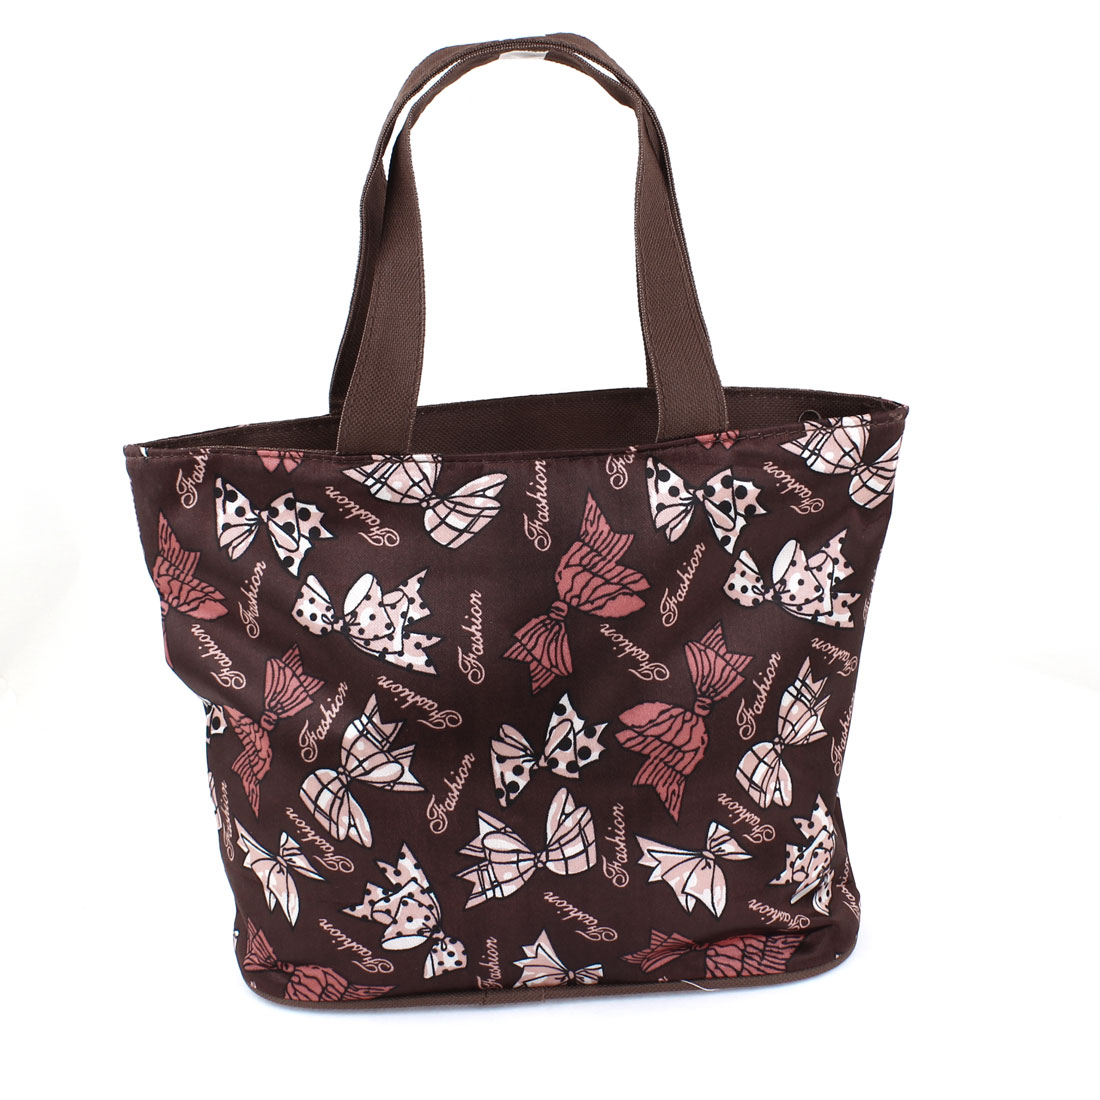 Zipper Closure Folding Bowknot Prints Shopping Hand Bag Handbag Tote Brown